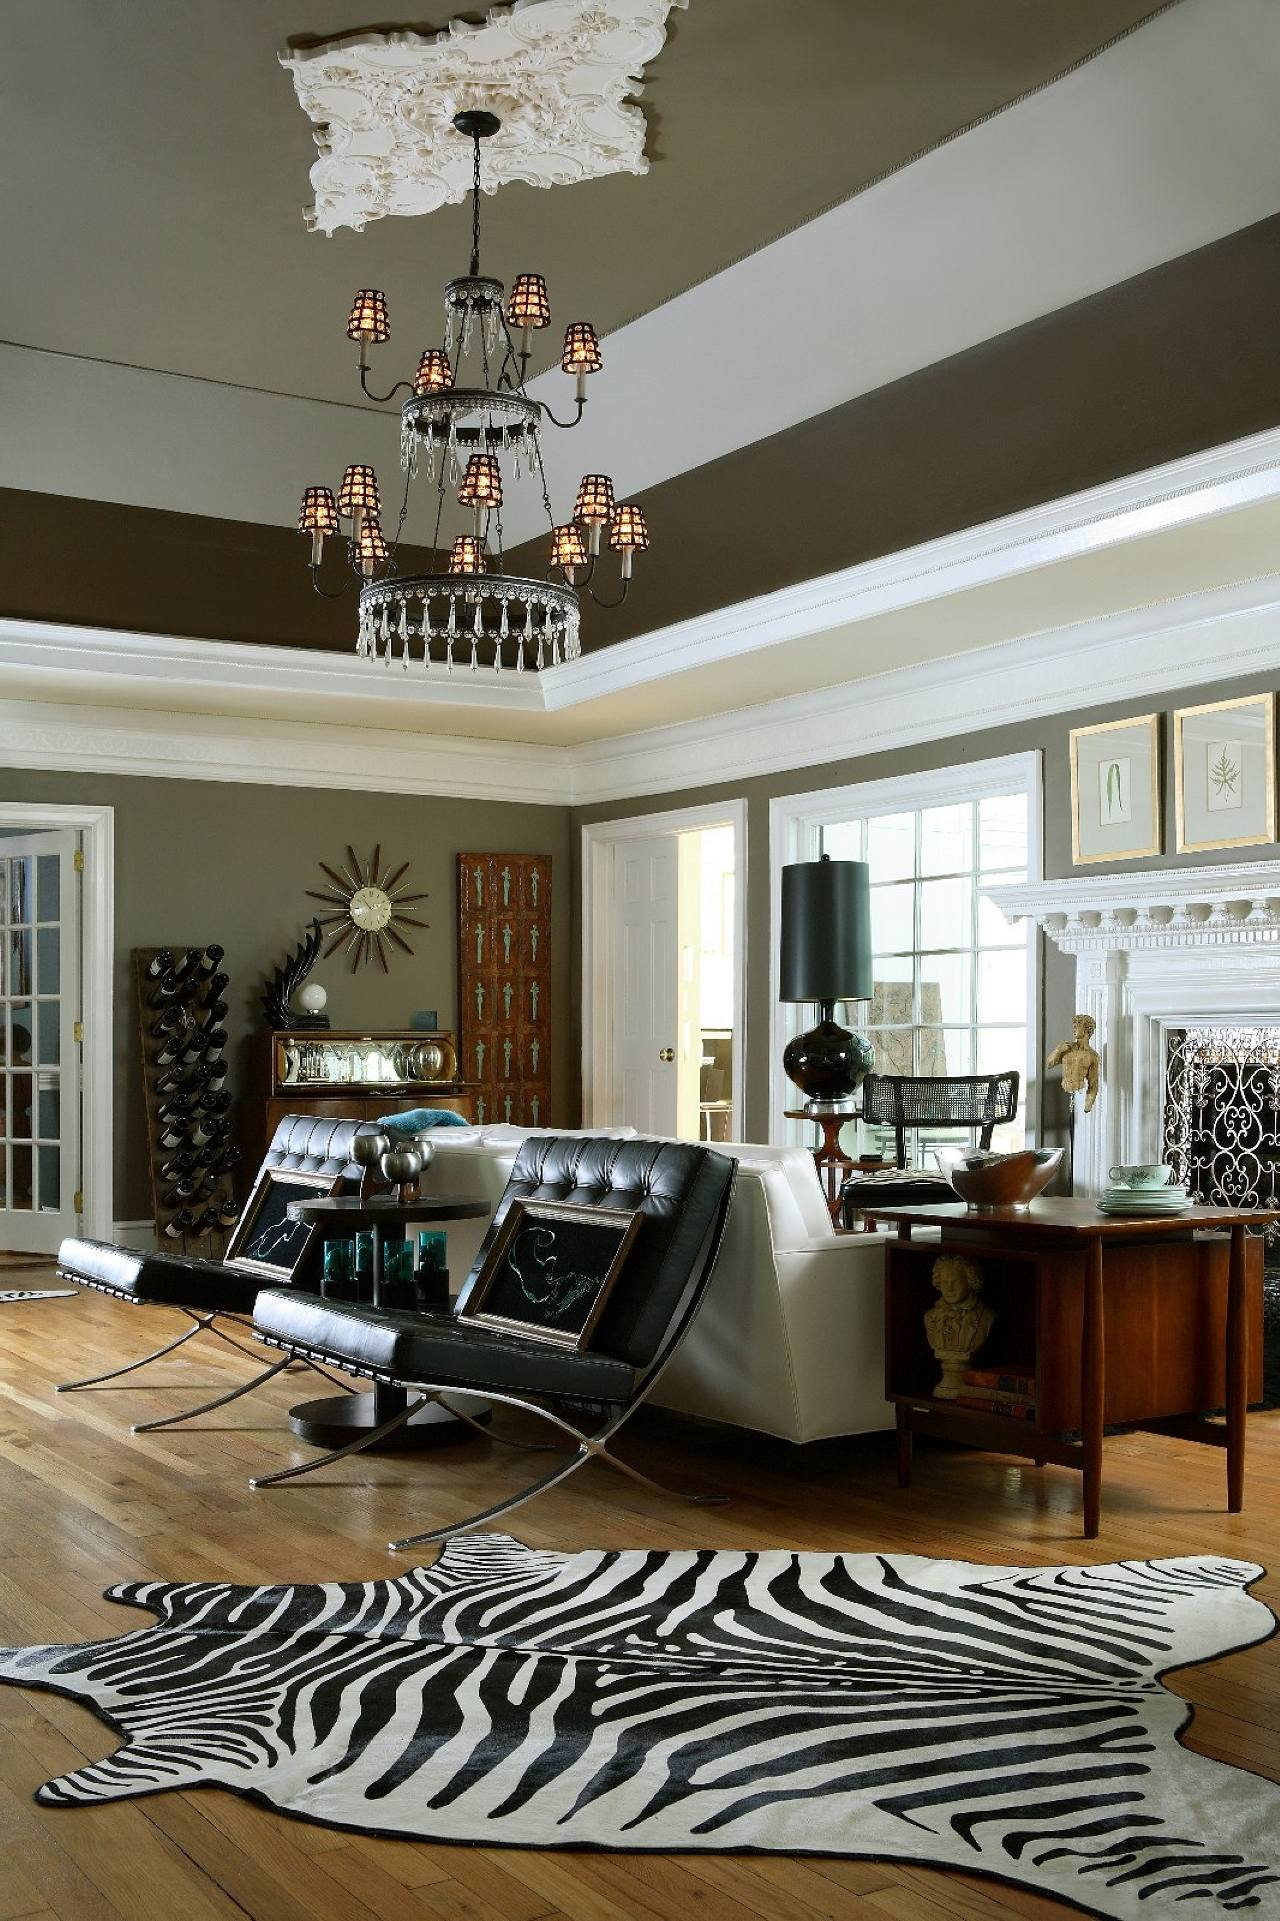 Eclectic Style interior design ideas